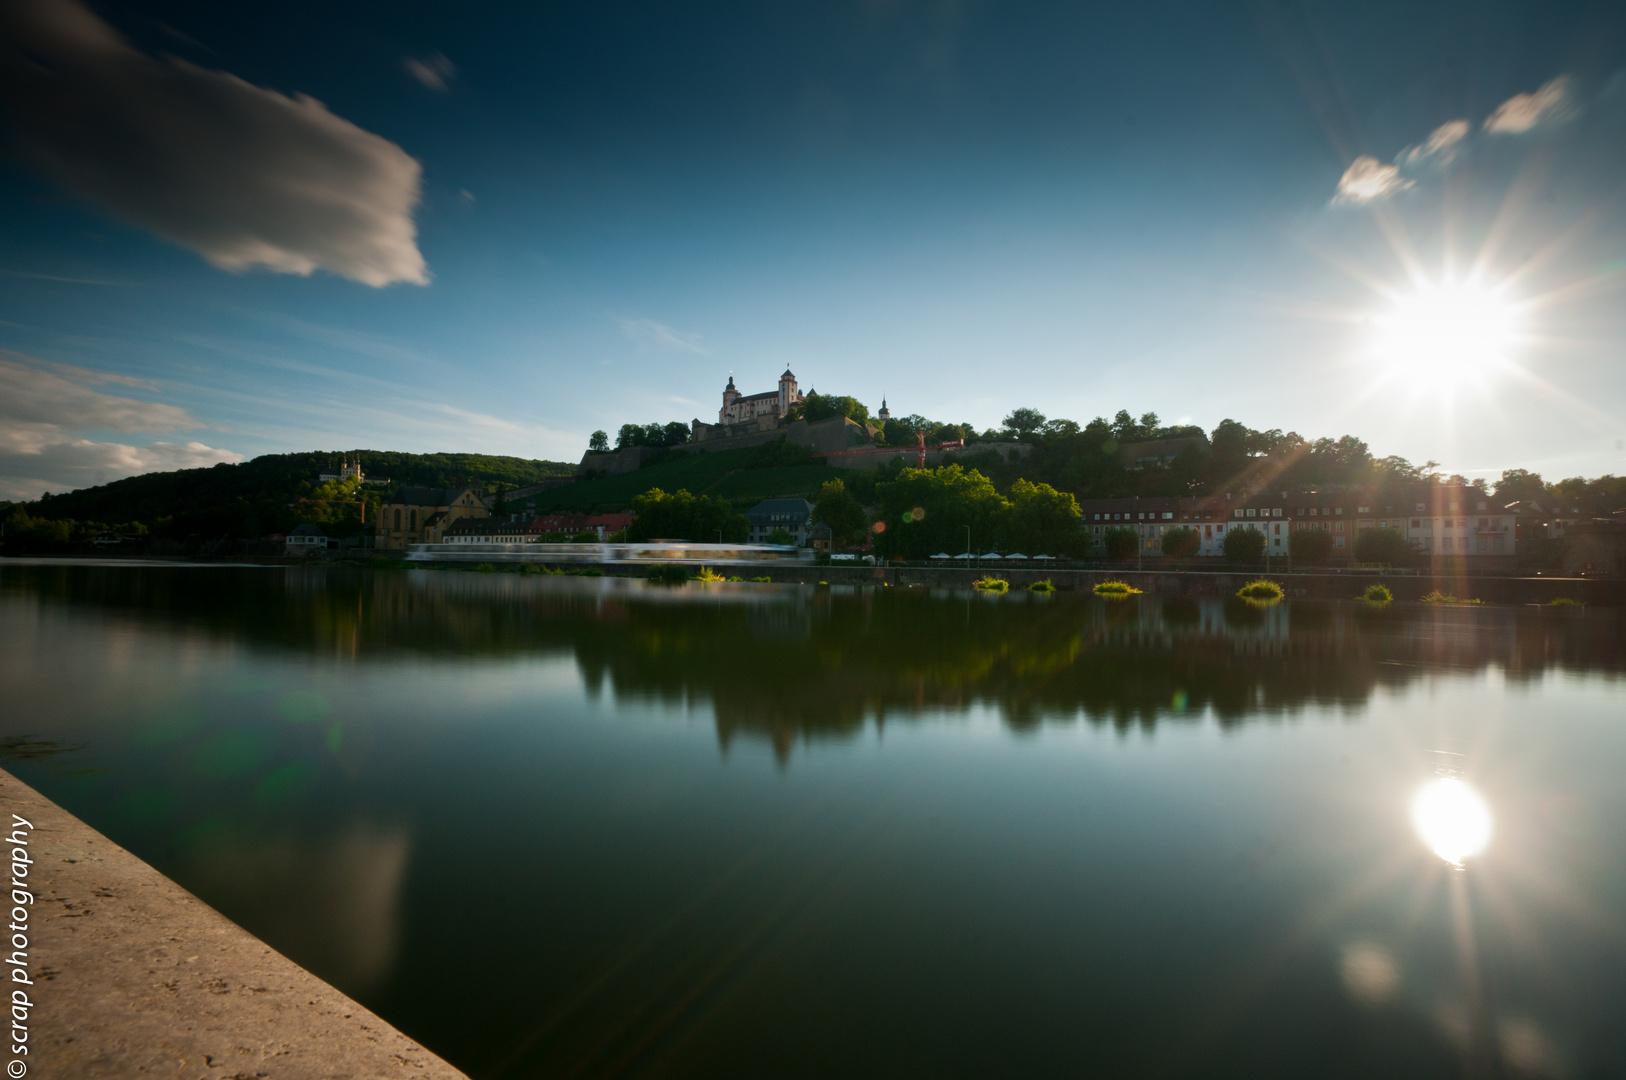 Würzburg: Festung Marienberg, Käppele, Main